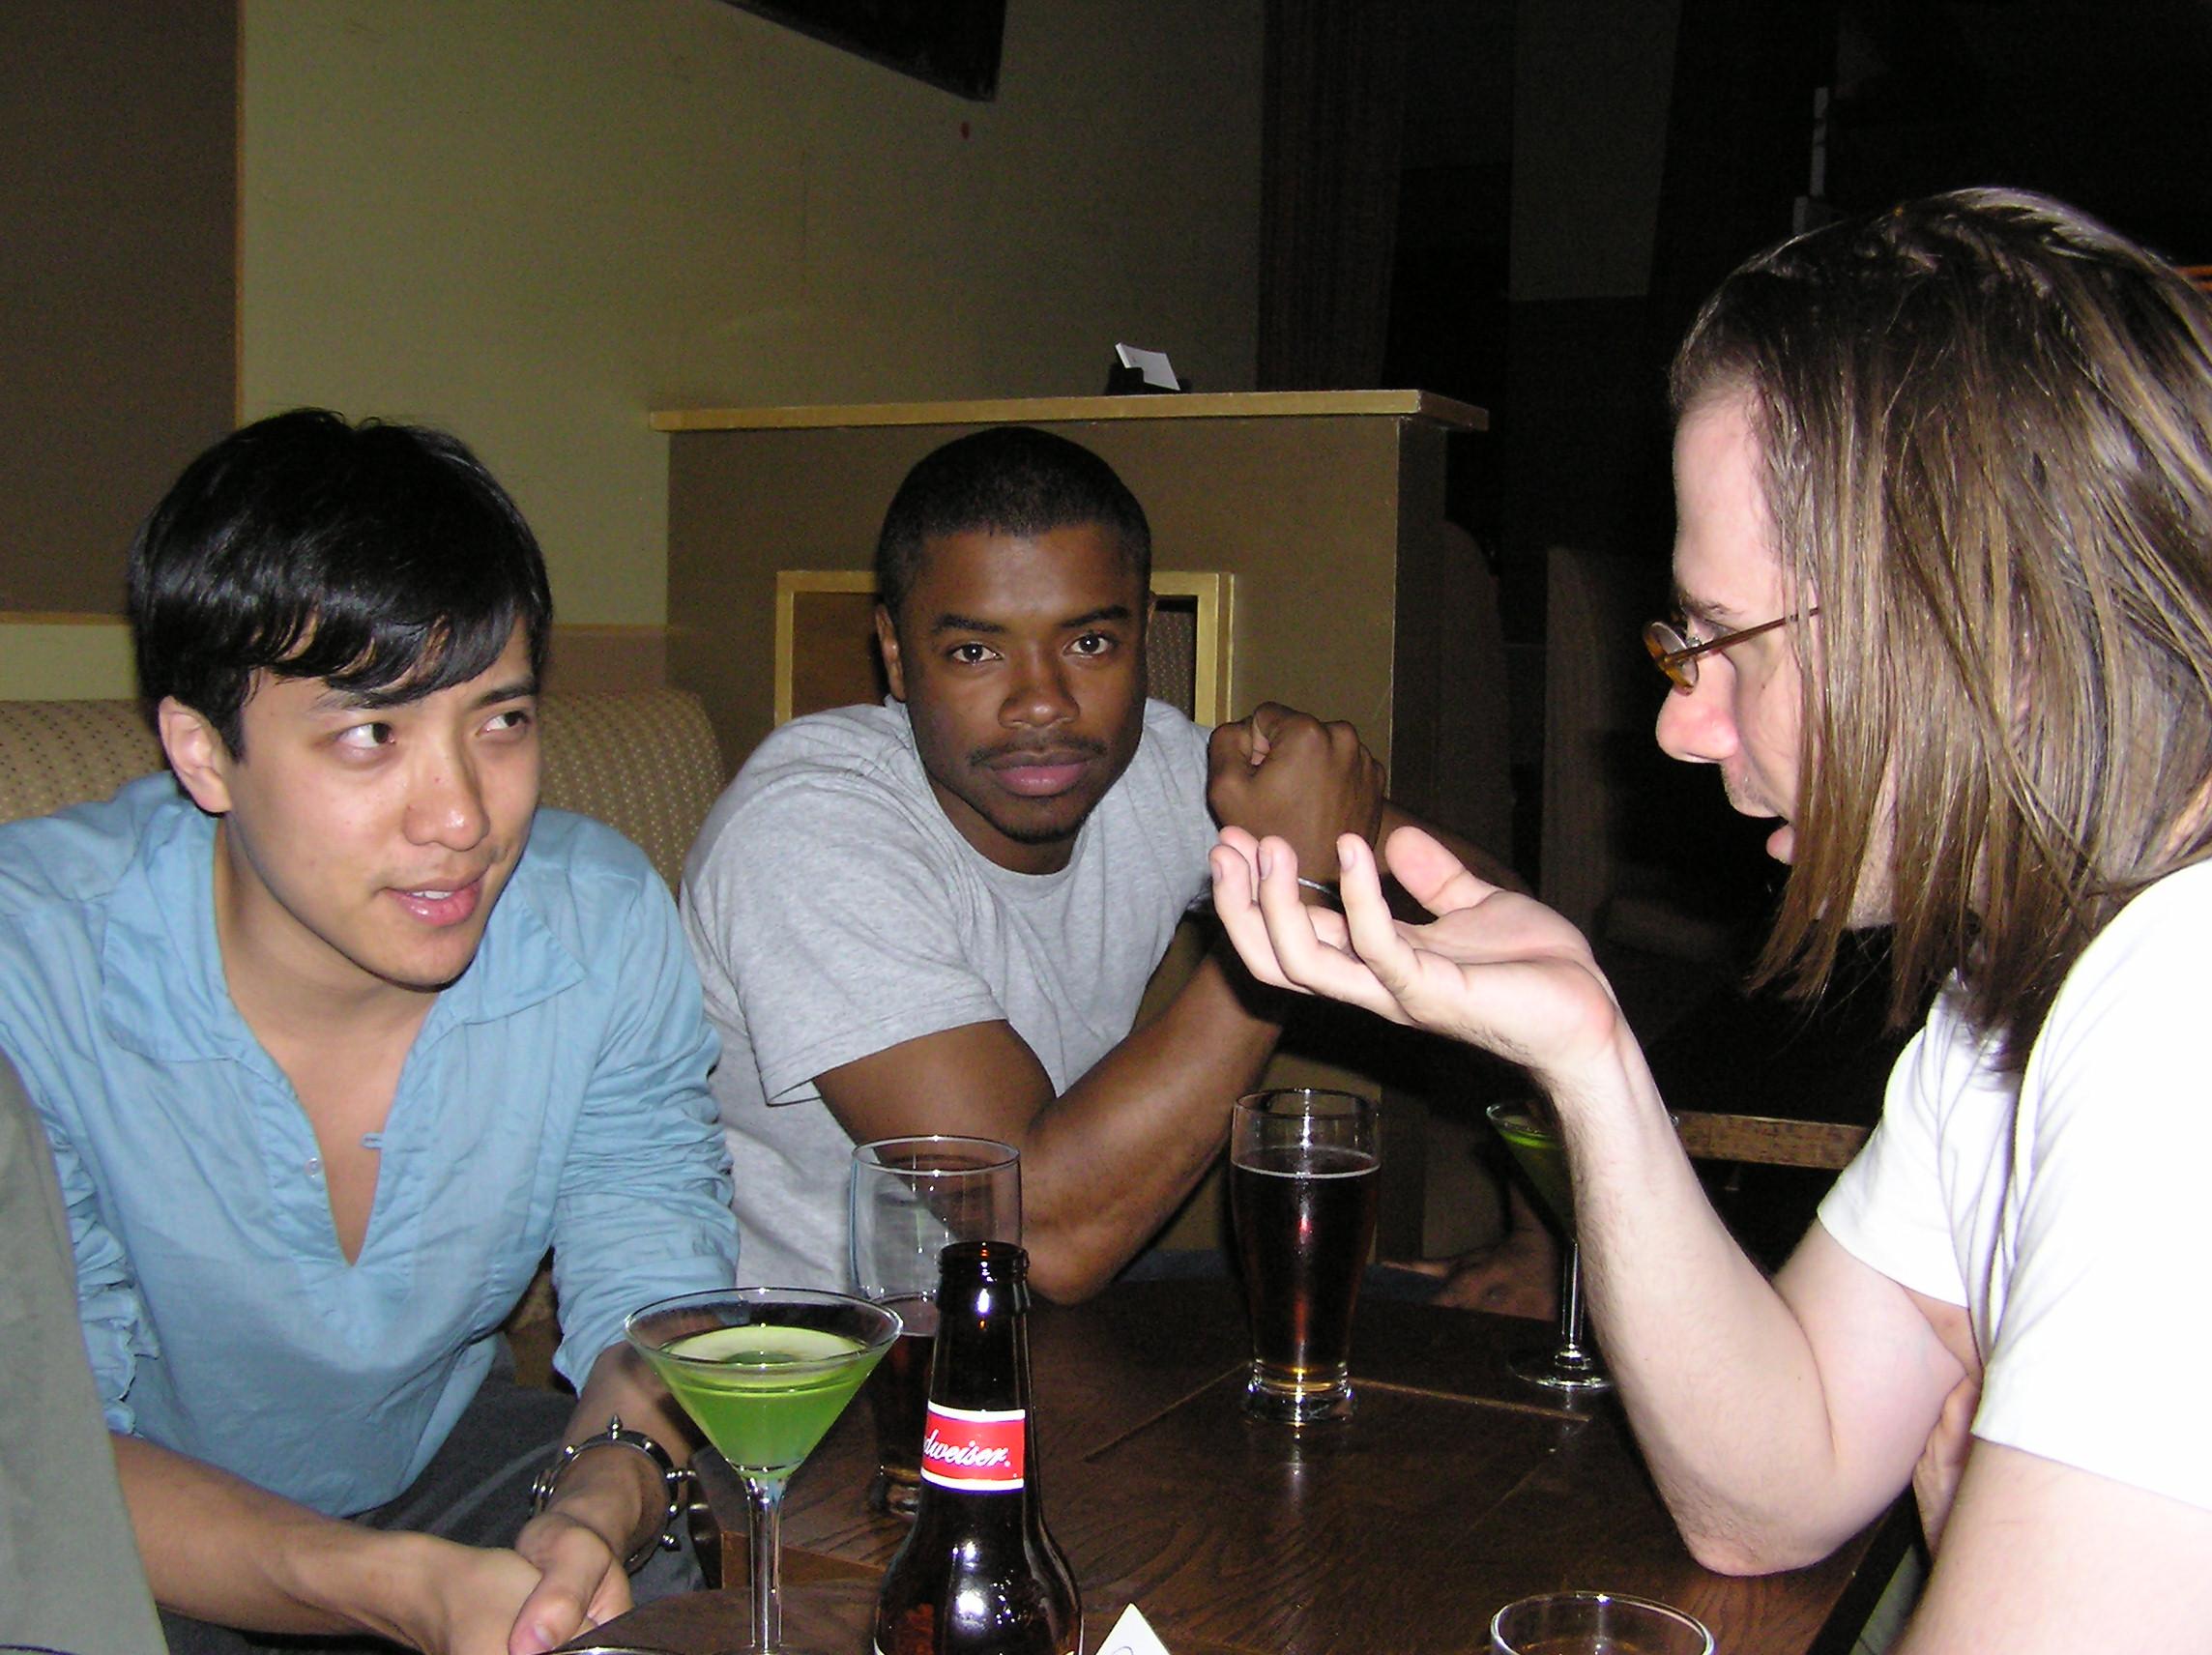 Ben, Charles, Adam circa 2004